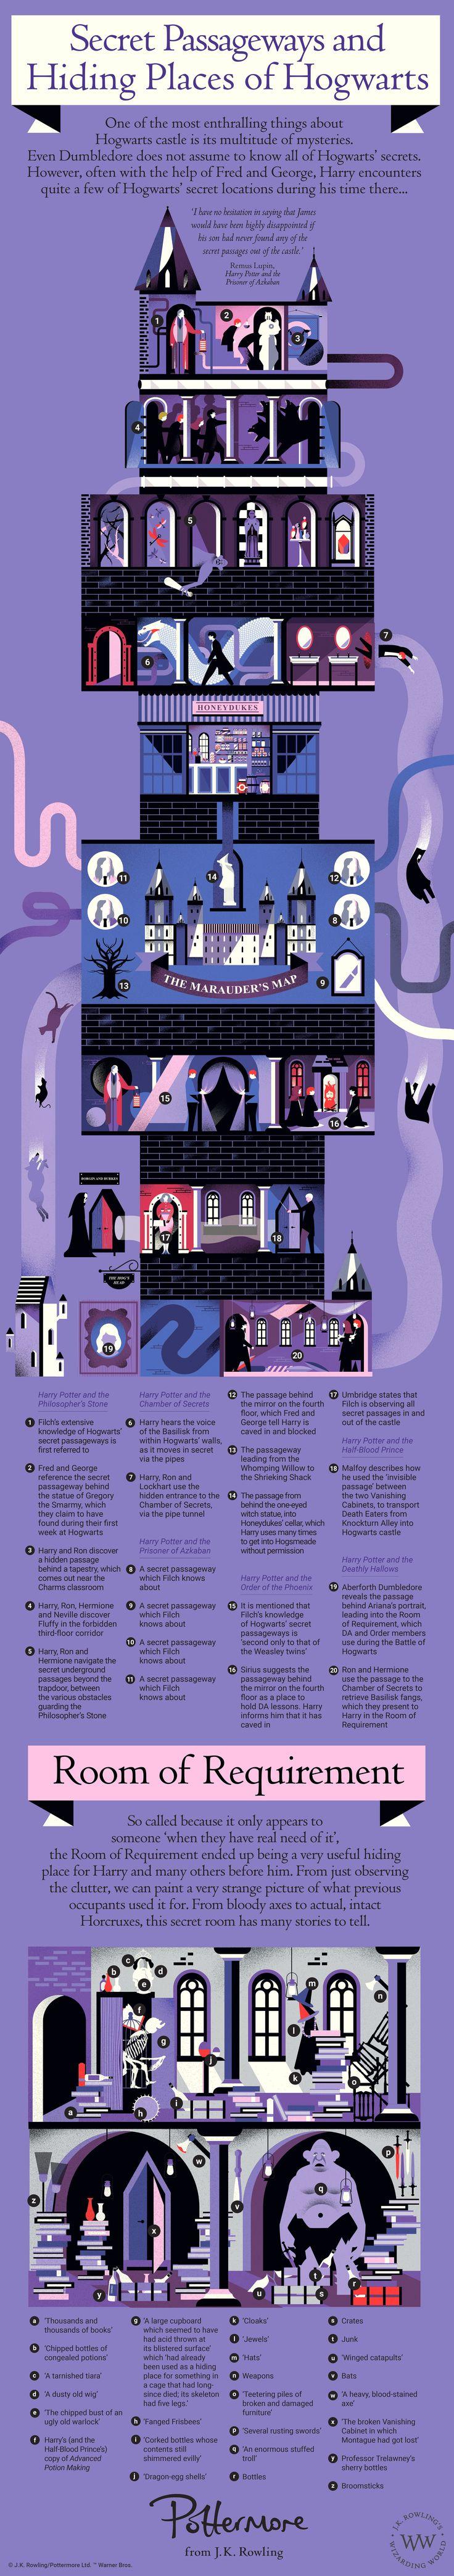 PM_Secret_Passageways_Infographic.jpg (2600×14753) All rights: J.K. Rowling, Pottermore, Warner Bros.